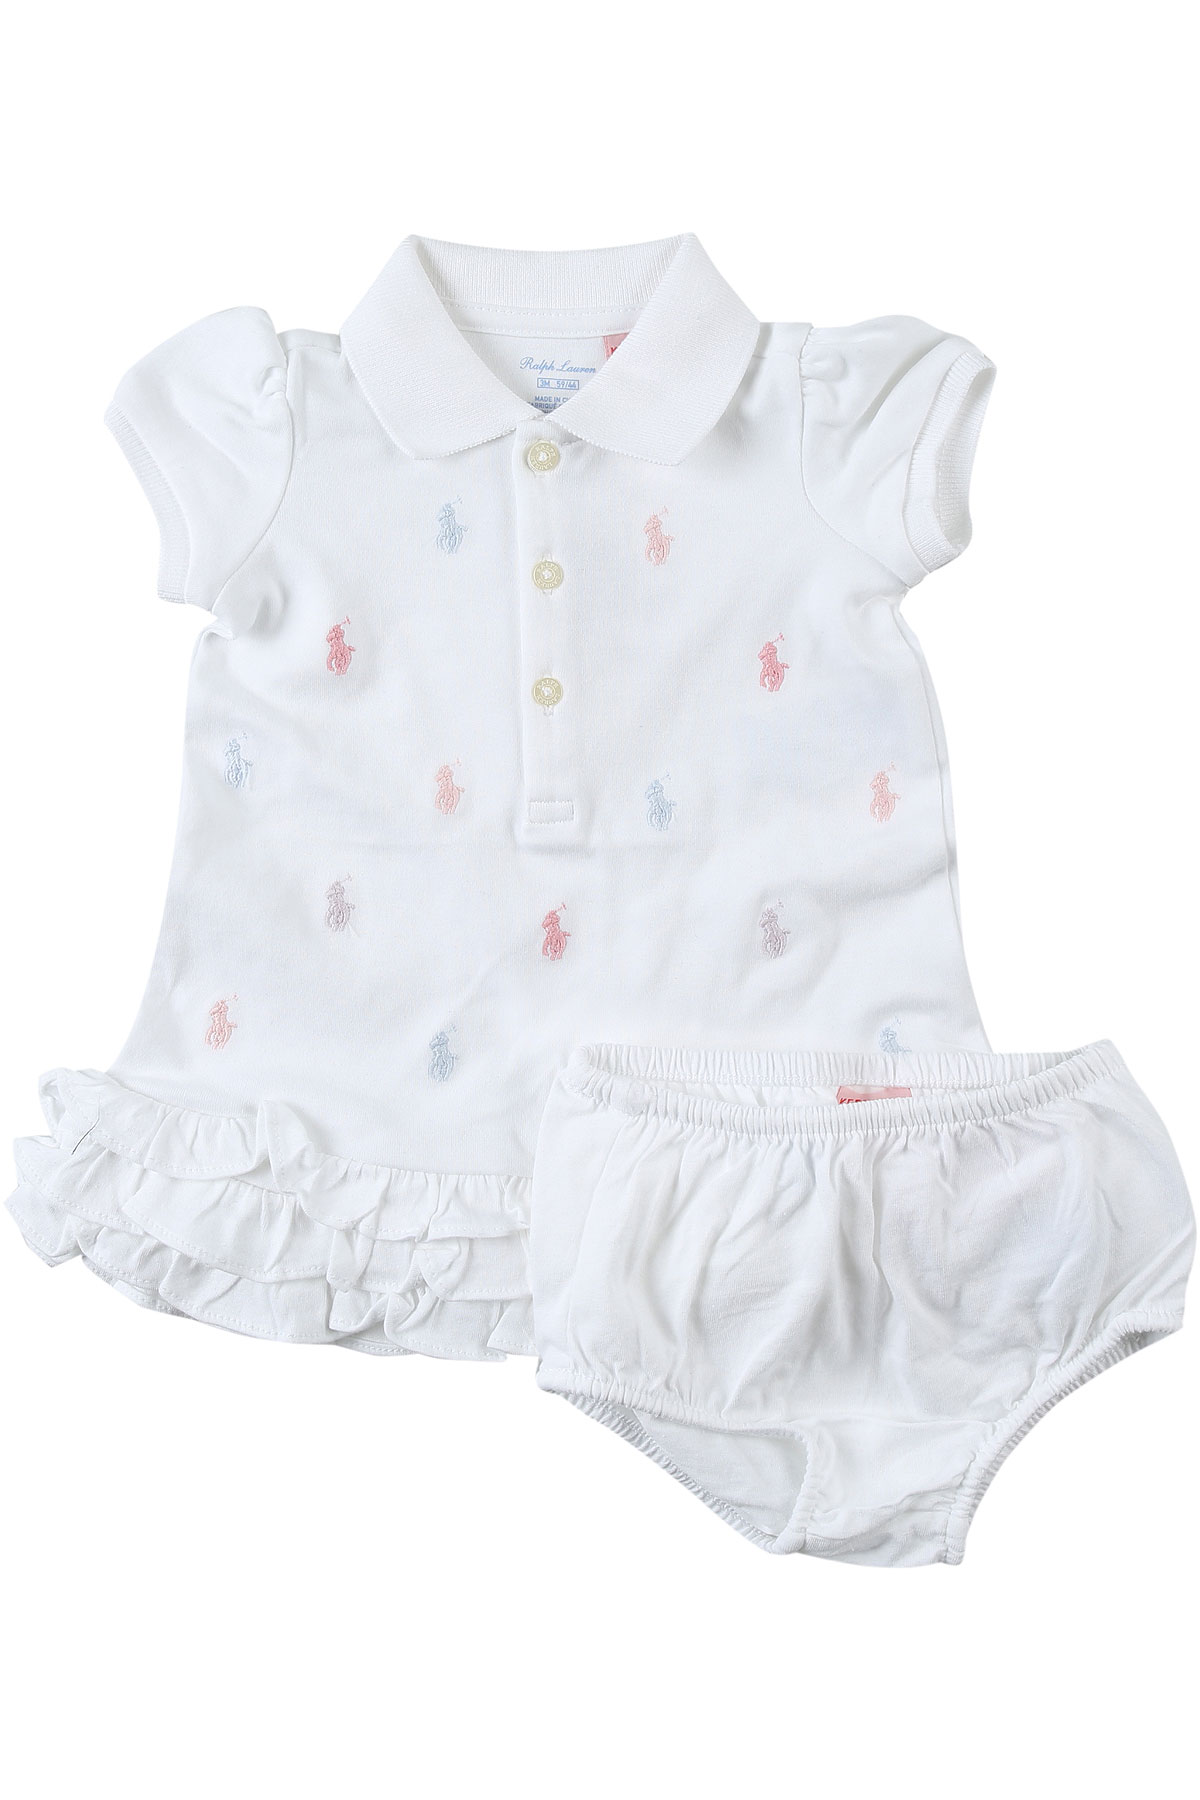 Ralph Lauren Baby Sets for Girls On Sale, White, Cotton, 2019, 12M 18M 2Y 9M 9M